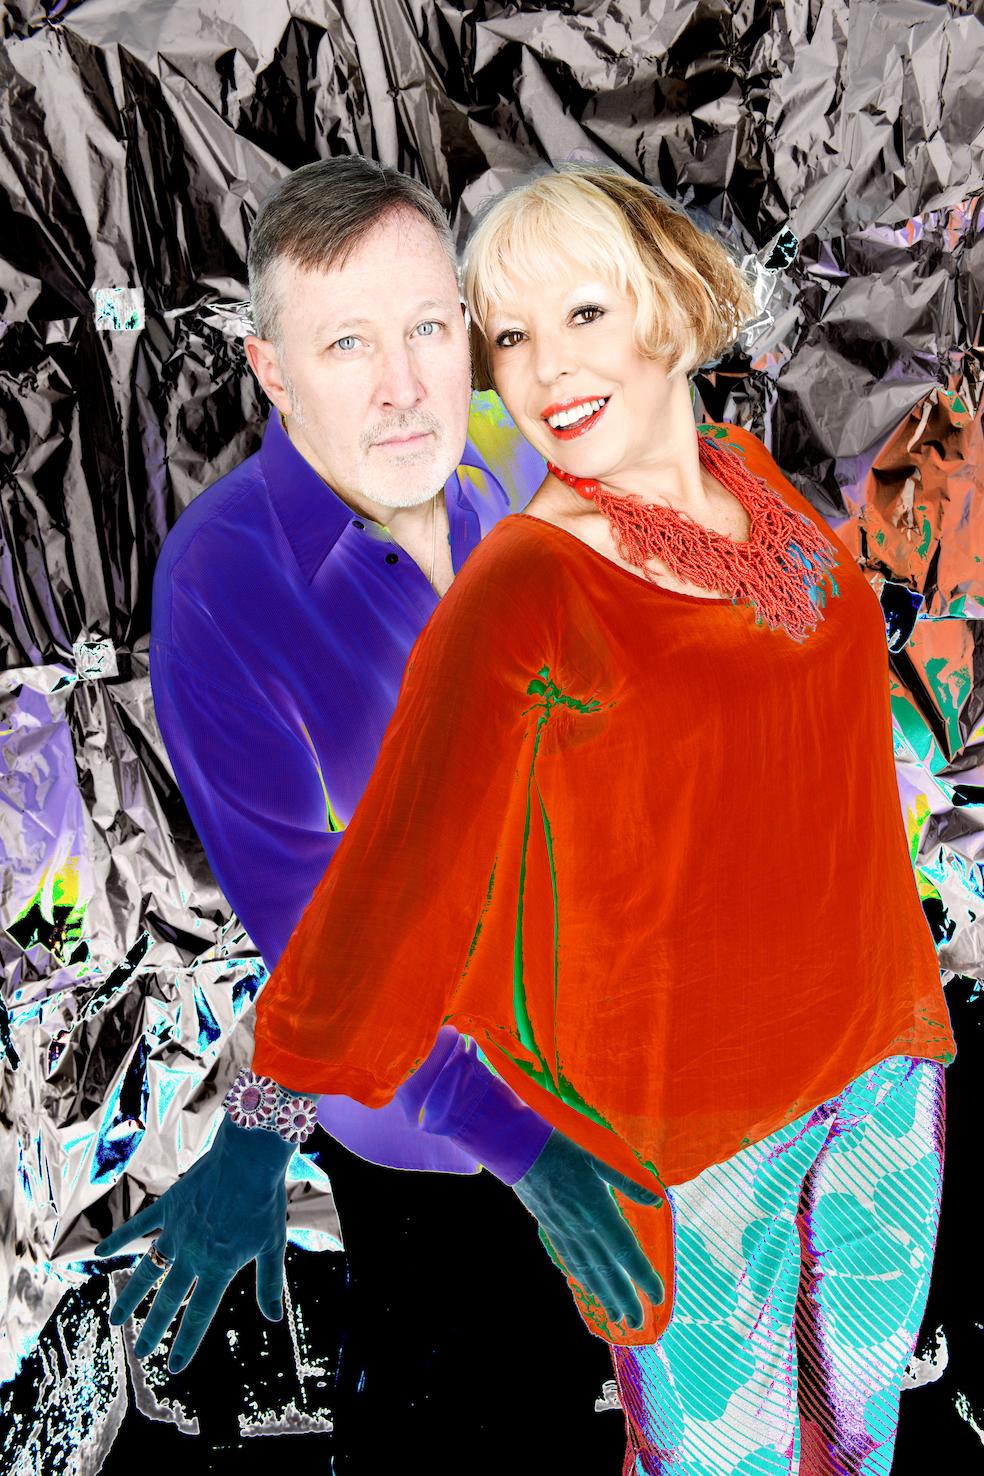 John McDaniel and Barb Jungr, Photo Credit: Steve Ullathome